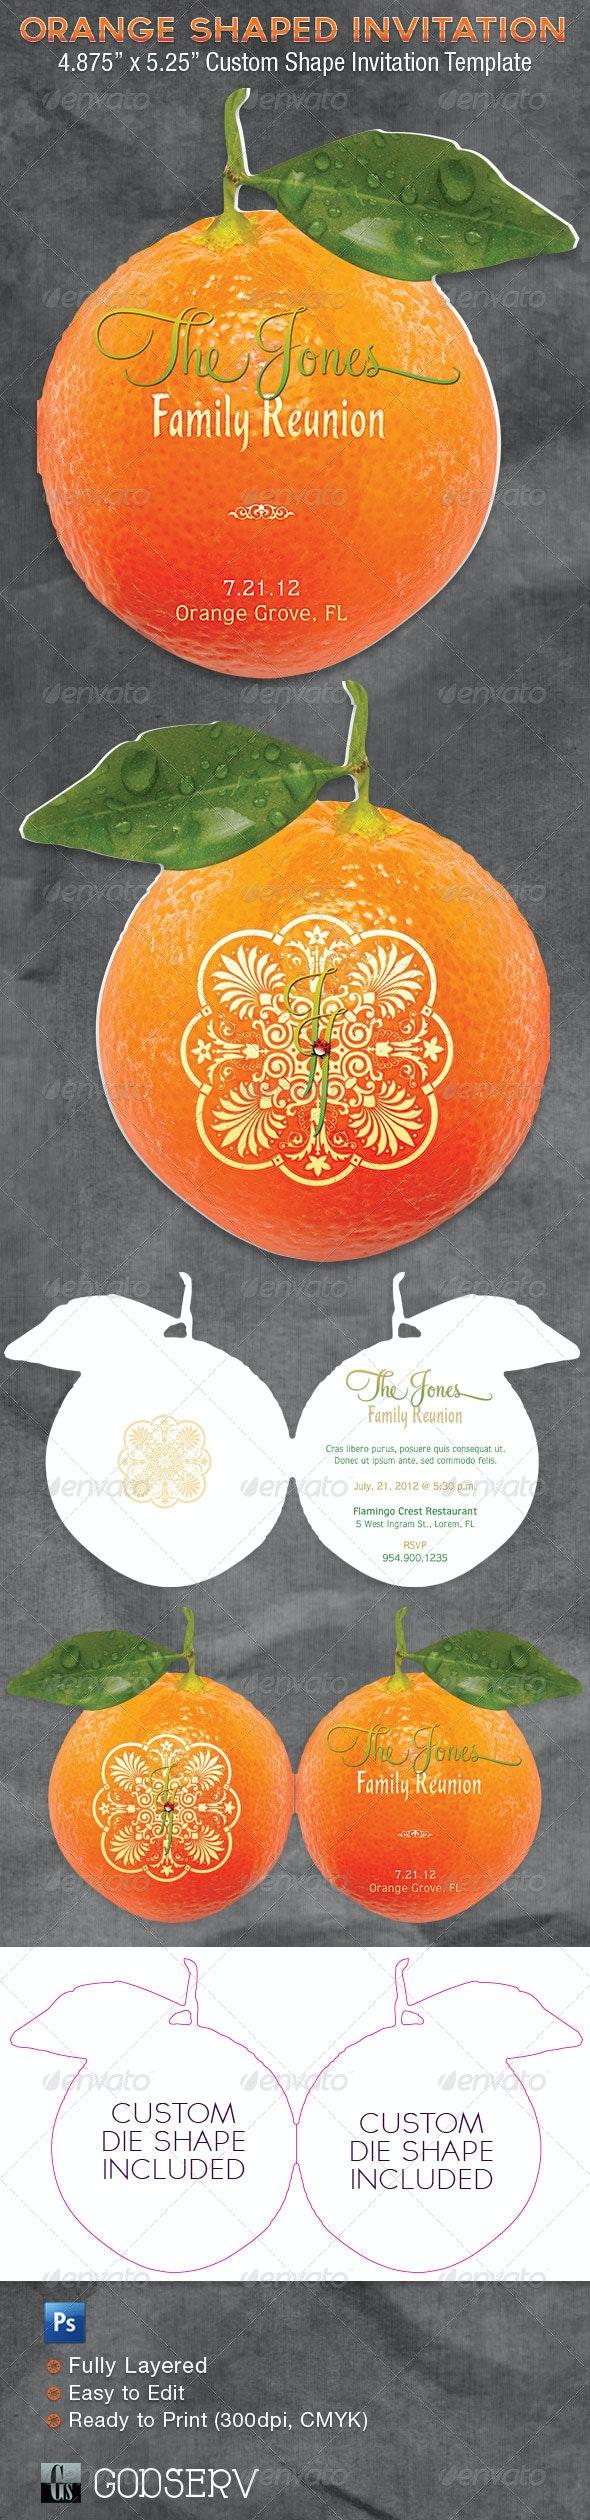 Orange Shaped Invitation Card Template - Invitations Cards & Invites